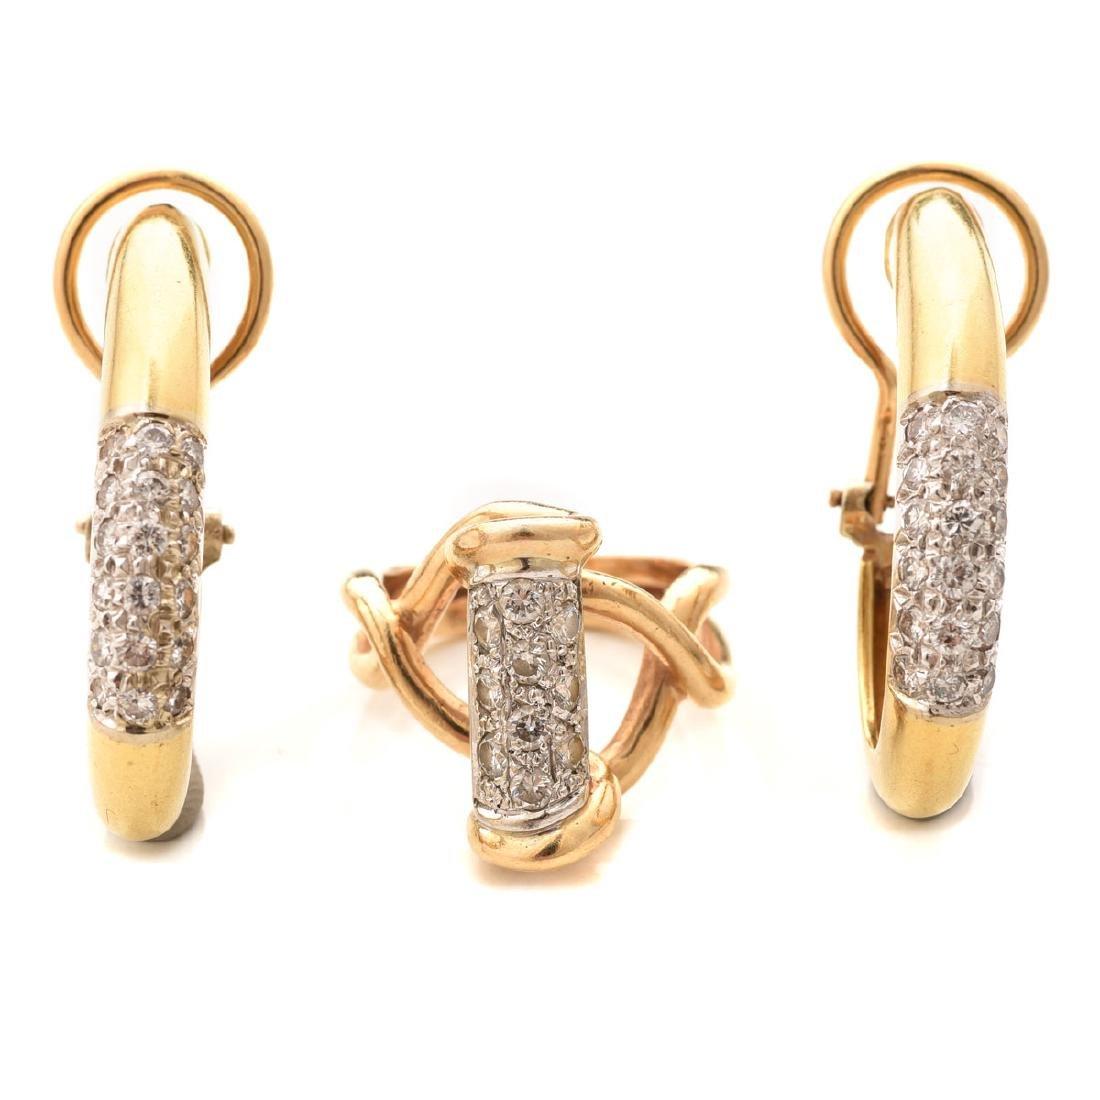 Diamond, Yellow & White Gold Jewelry Suite.